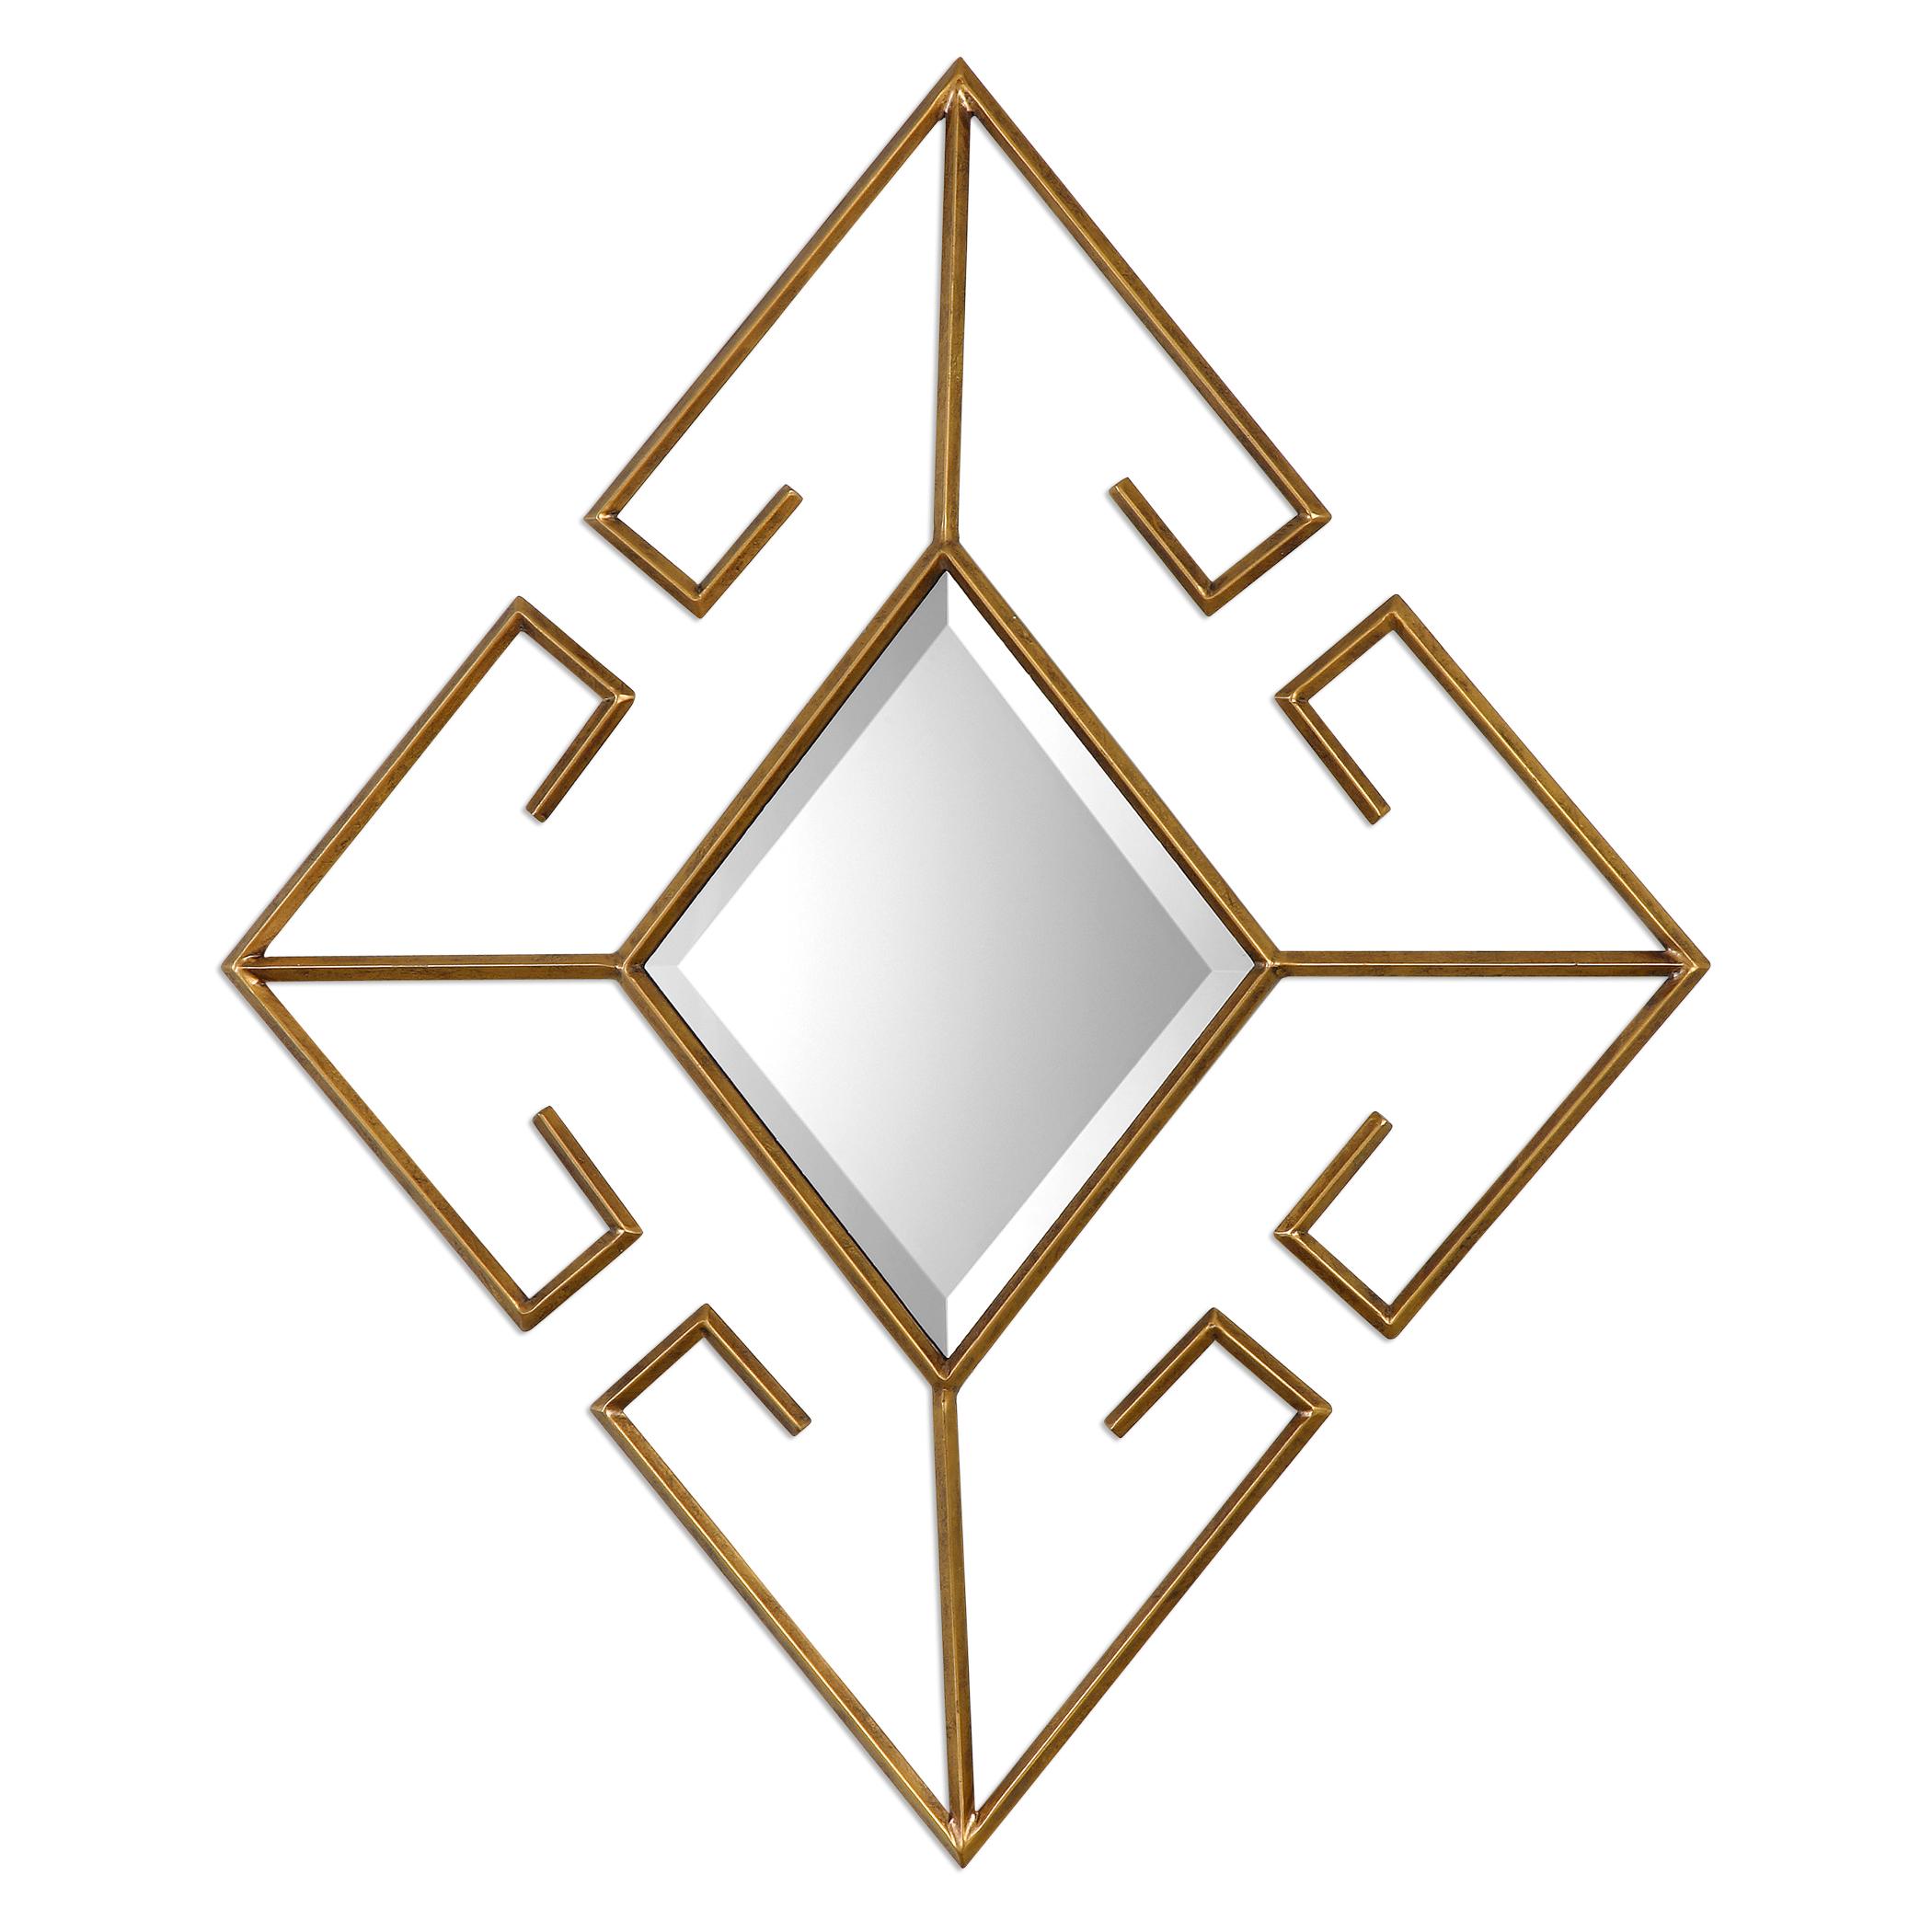 Uttermost Mirrors Gaetano Diamond Mirror - Item Number: 09099